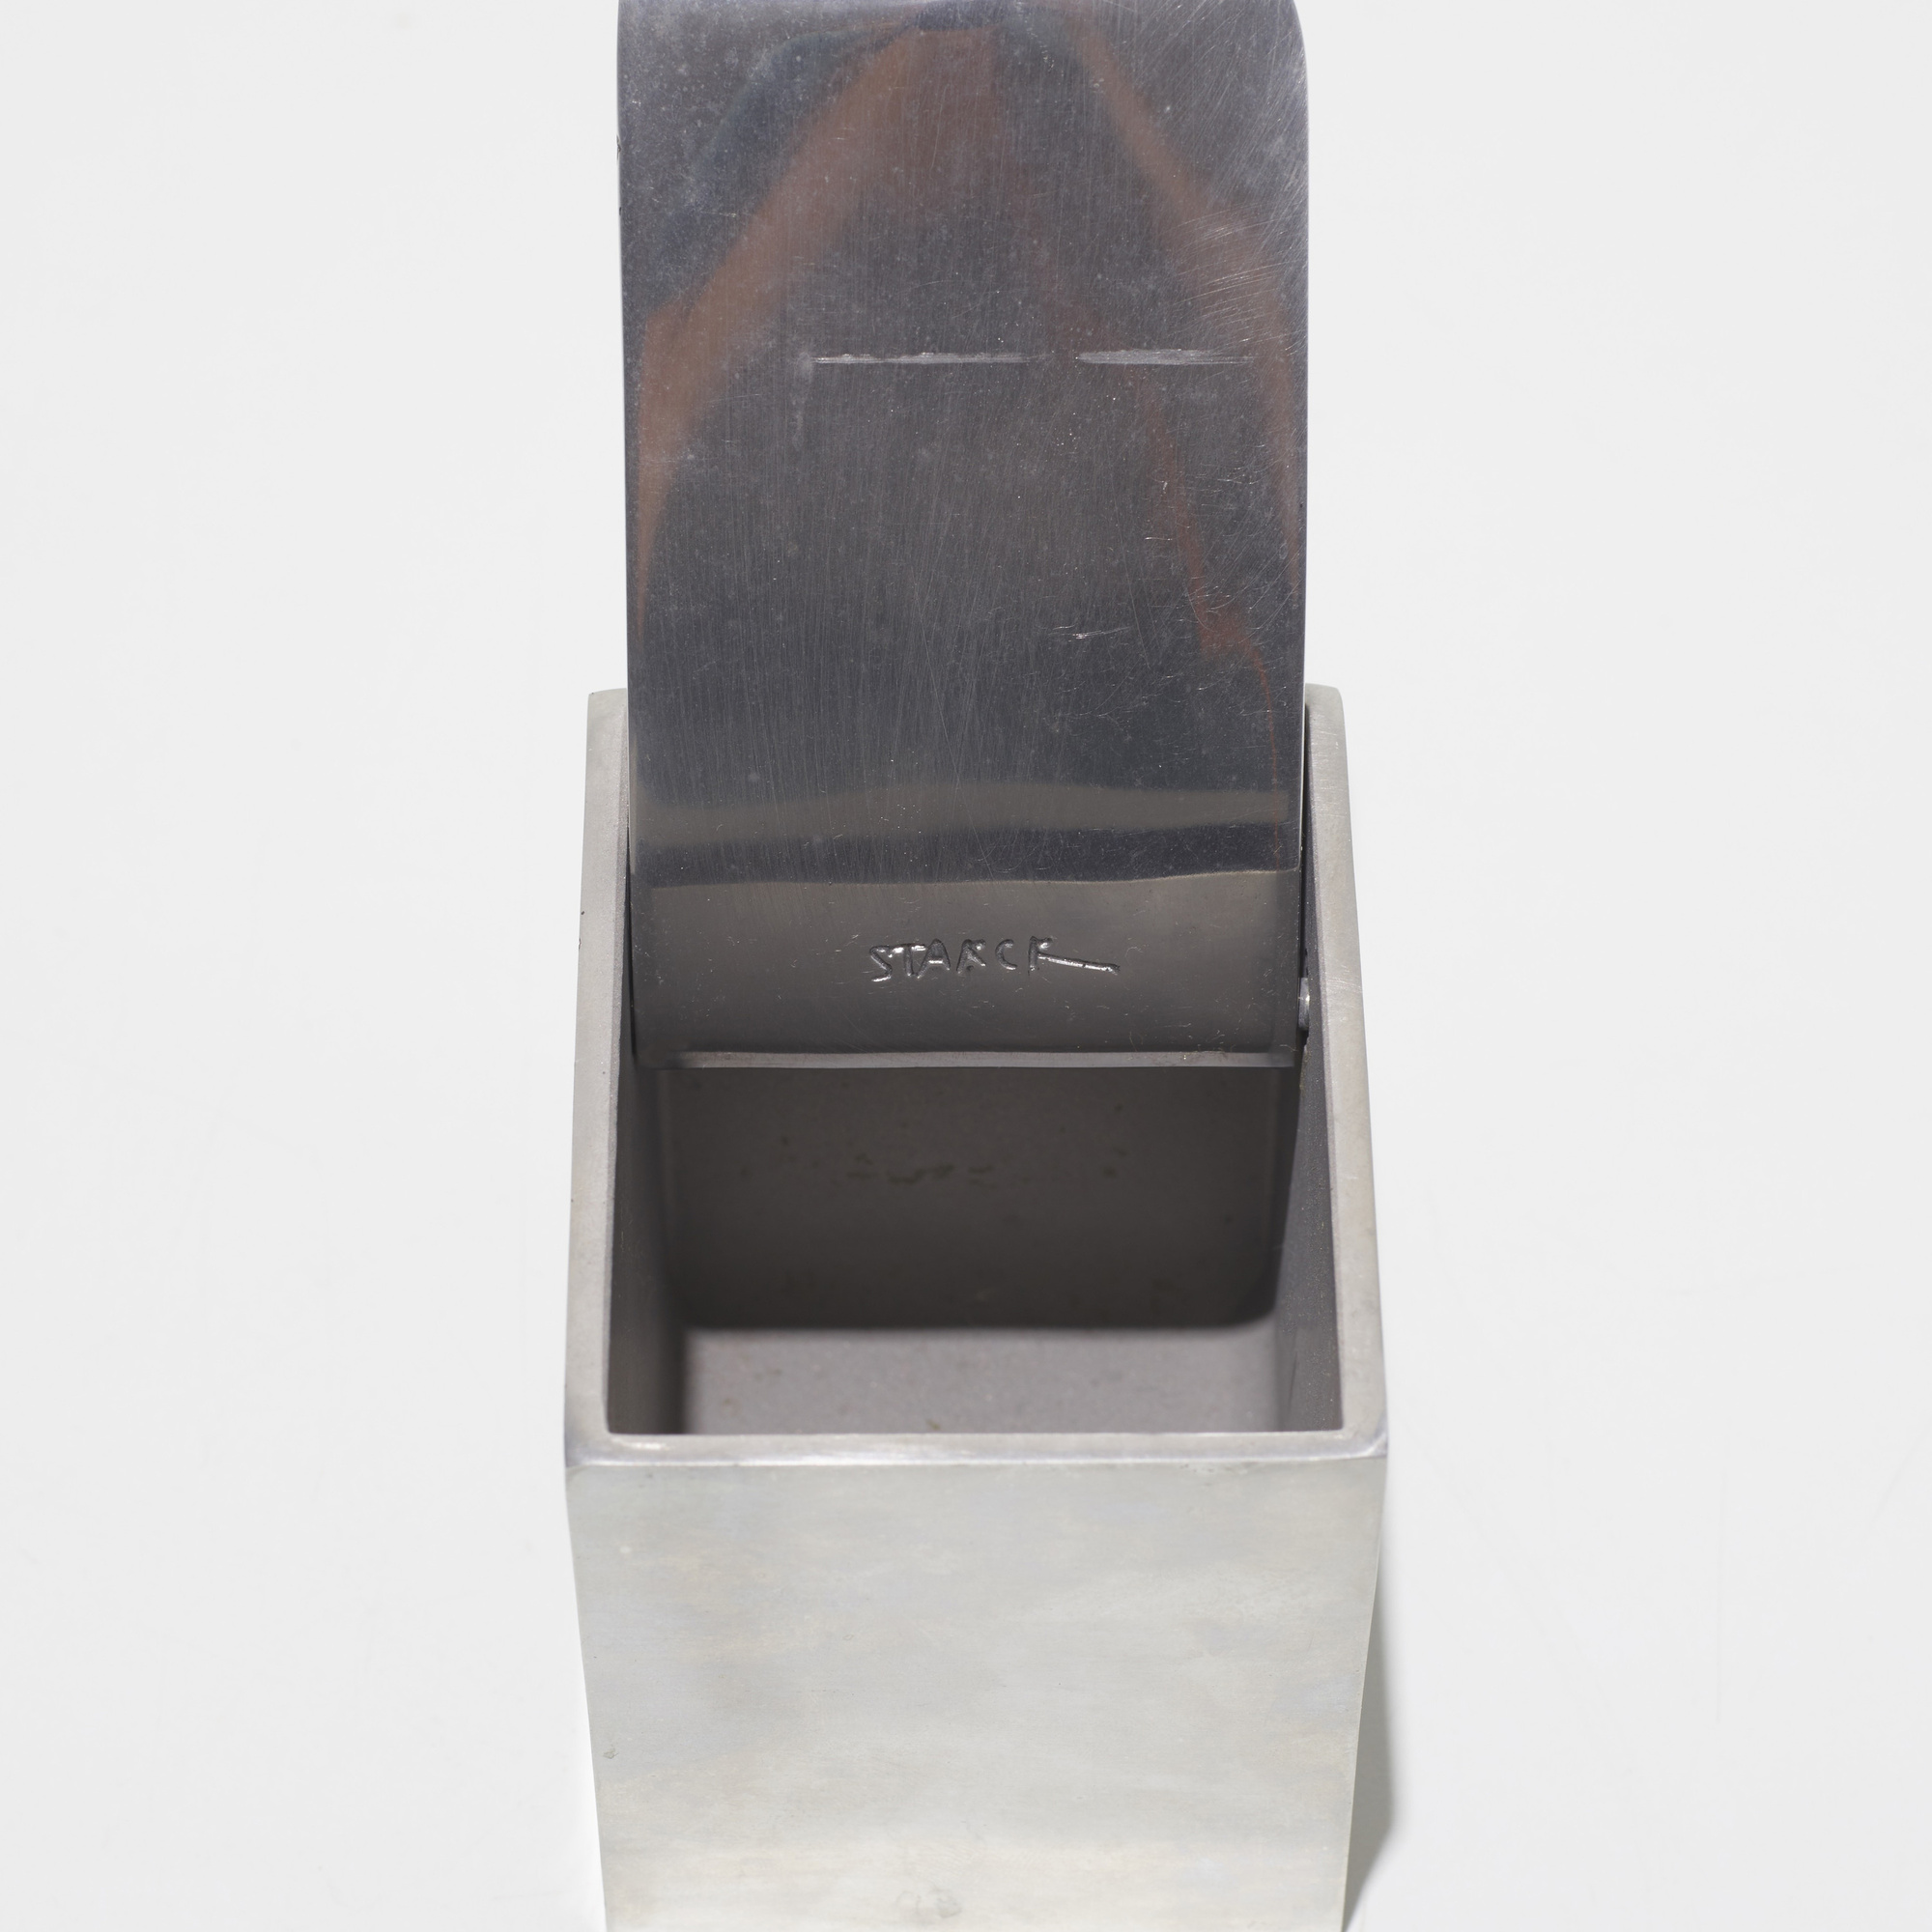 459: Philippe Starck / Ray Hollis ashtray (2 of 2)